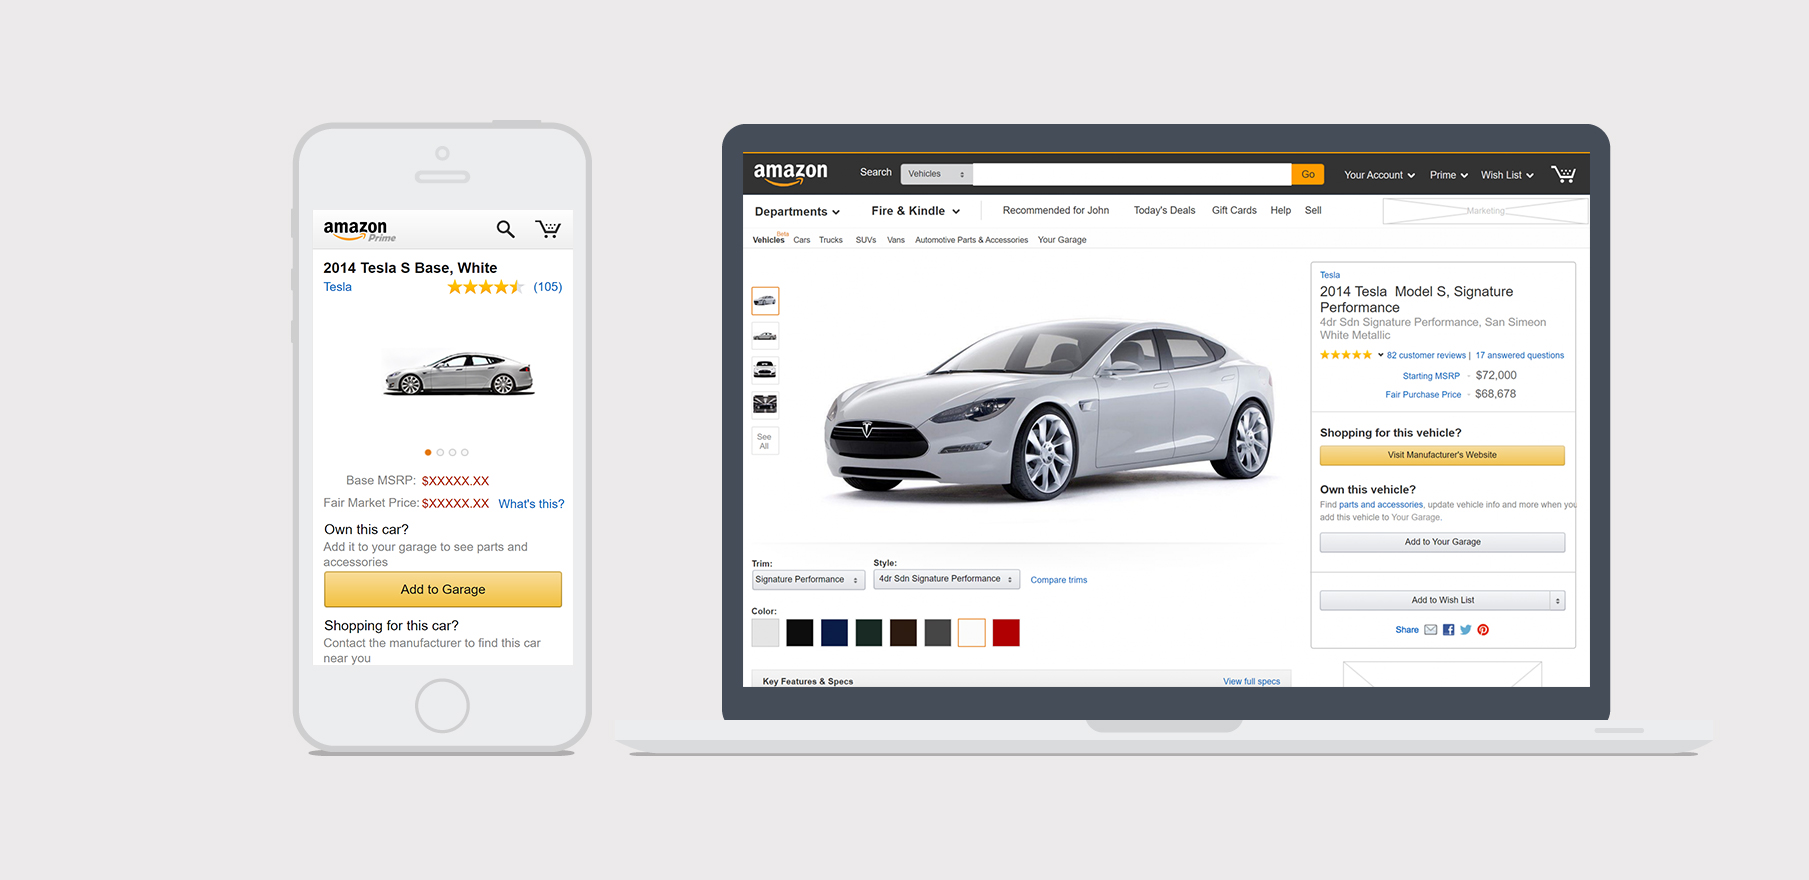 amazon vehicles - A car research platform for Amazon.